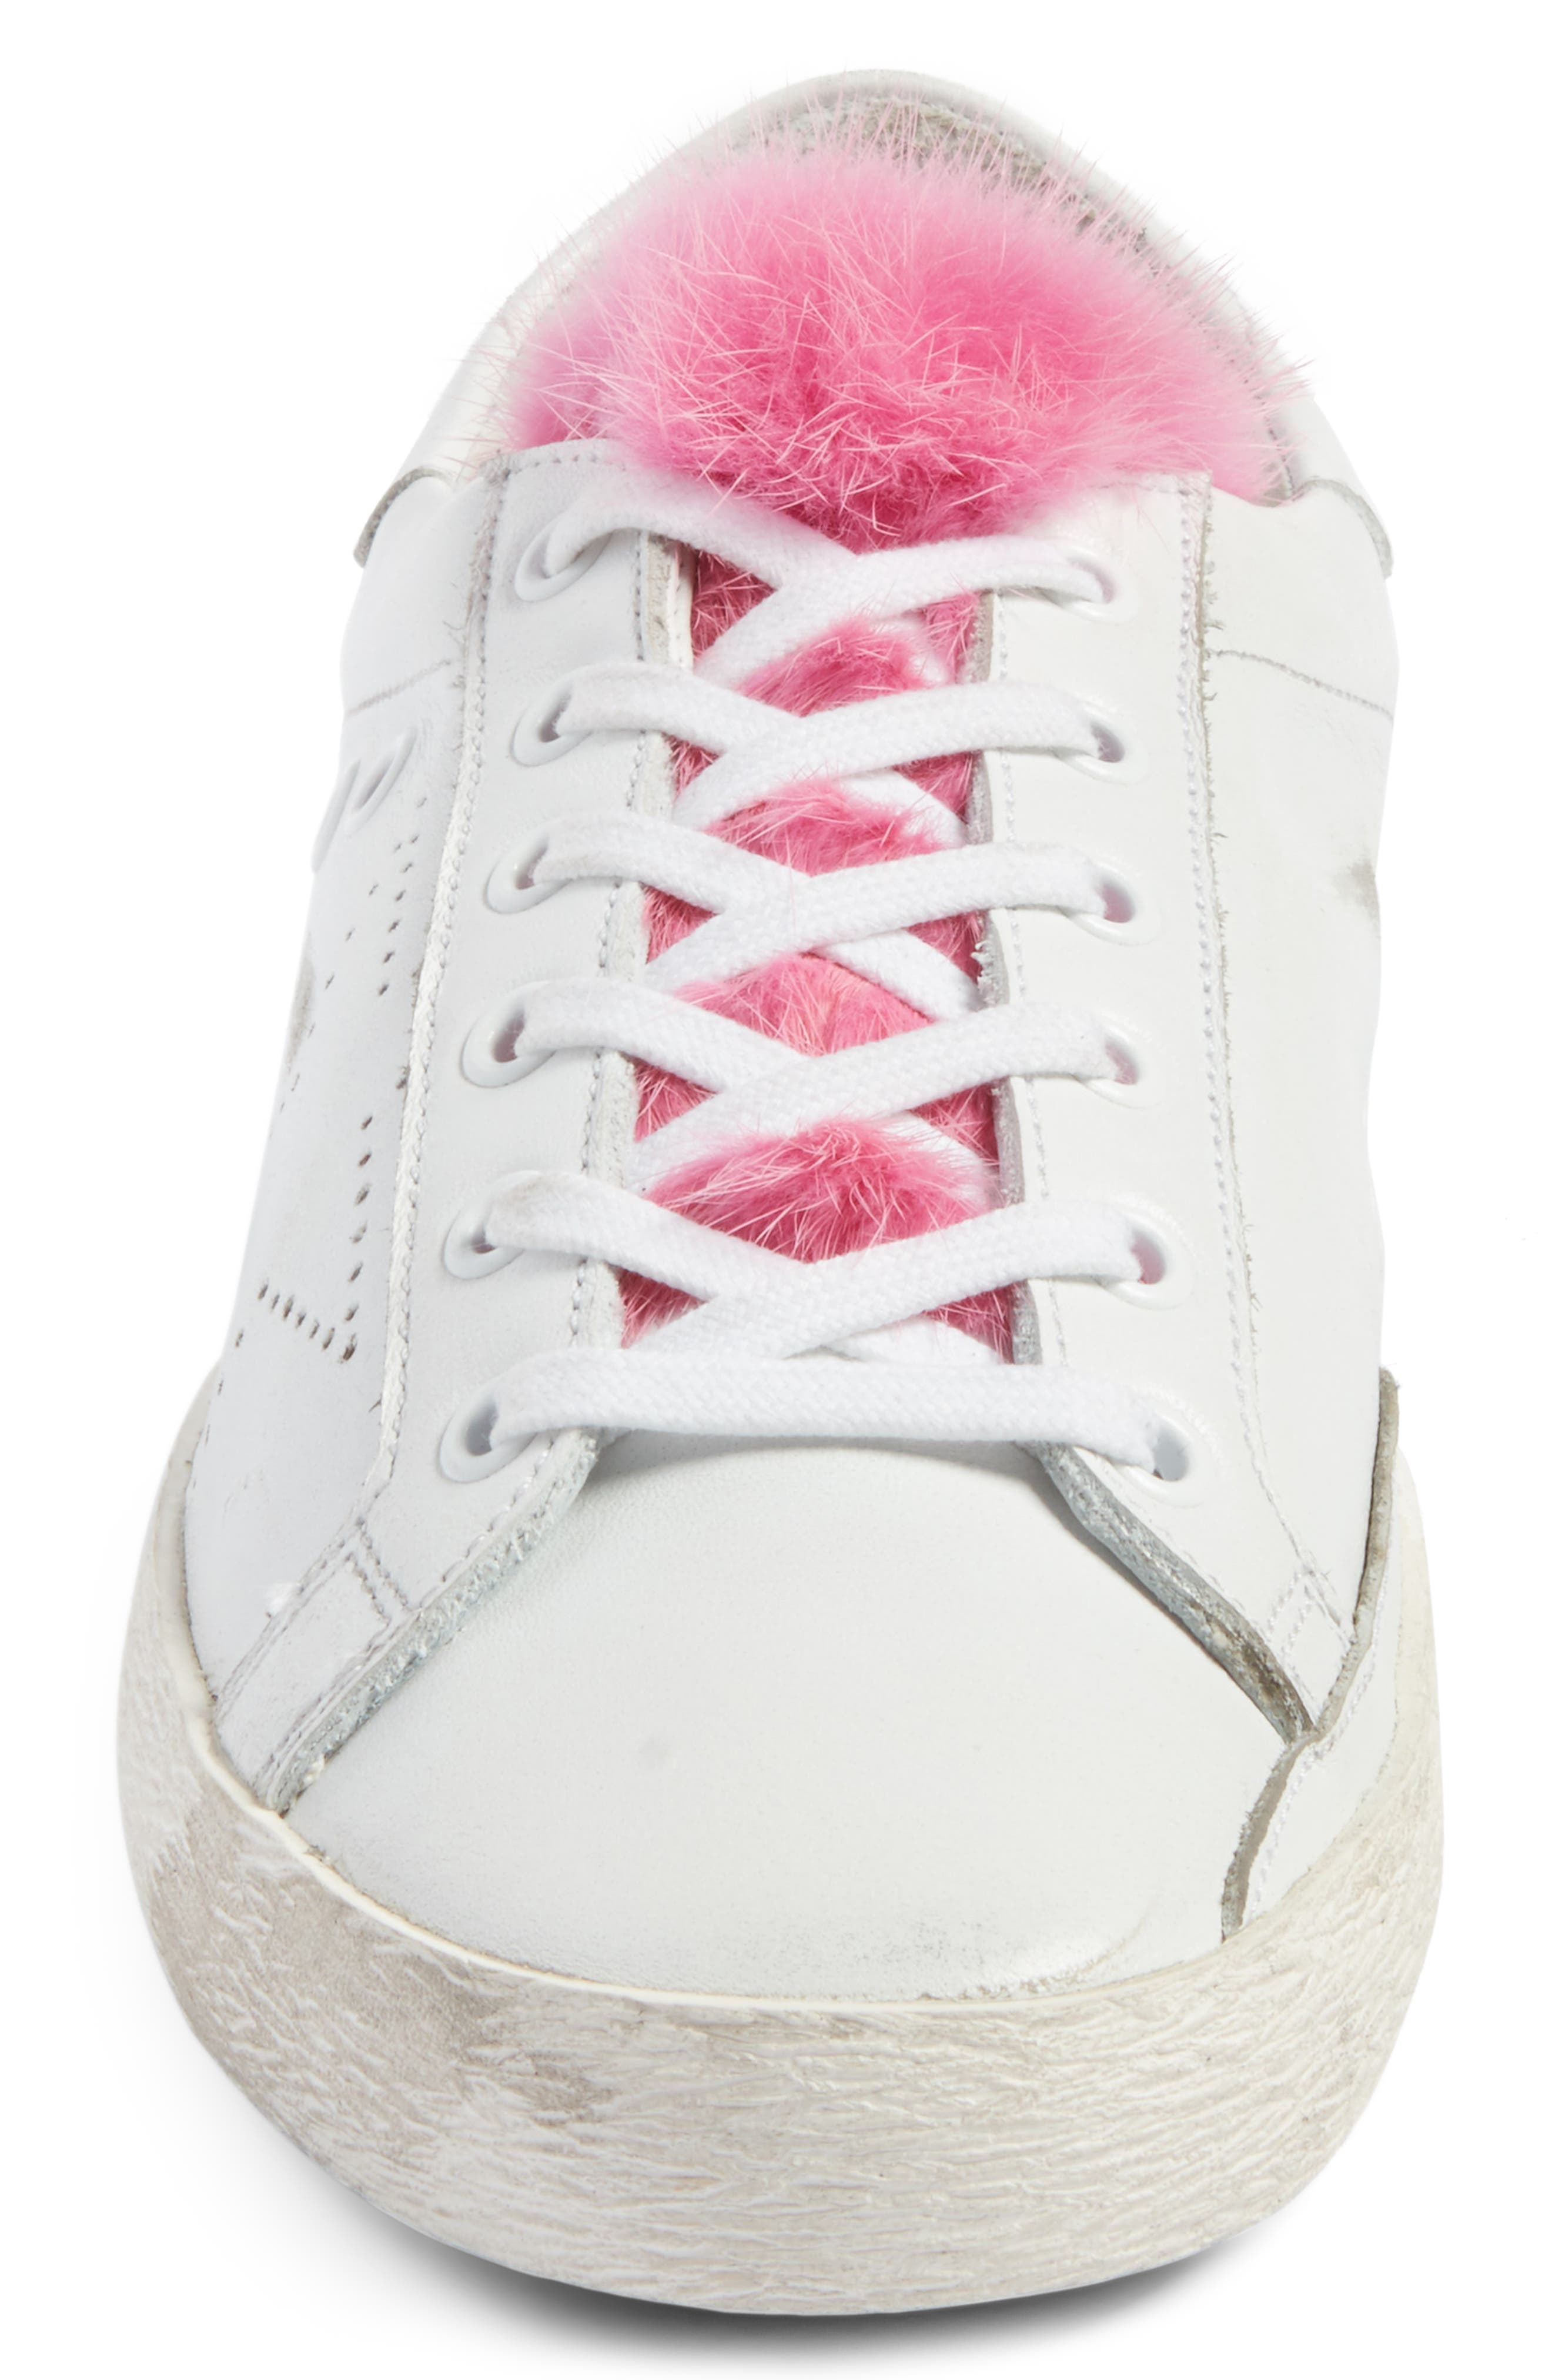 Superstar Genuine Mink Fur Sneaker,                             Alternate thumbnail 4, color,                             White Leather/ Pink